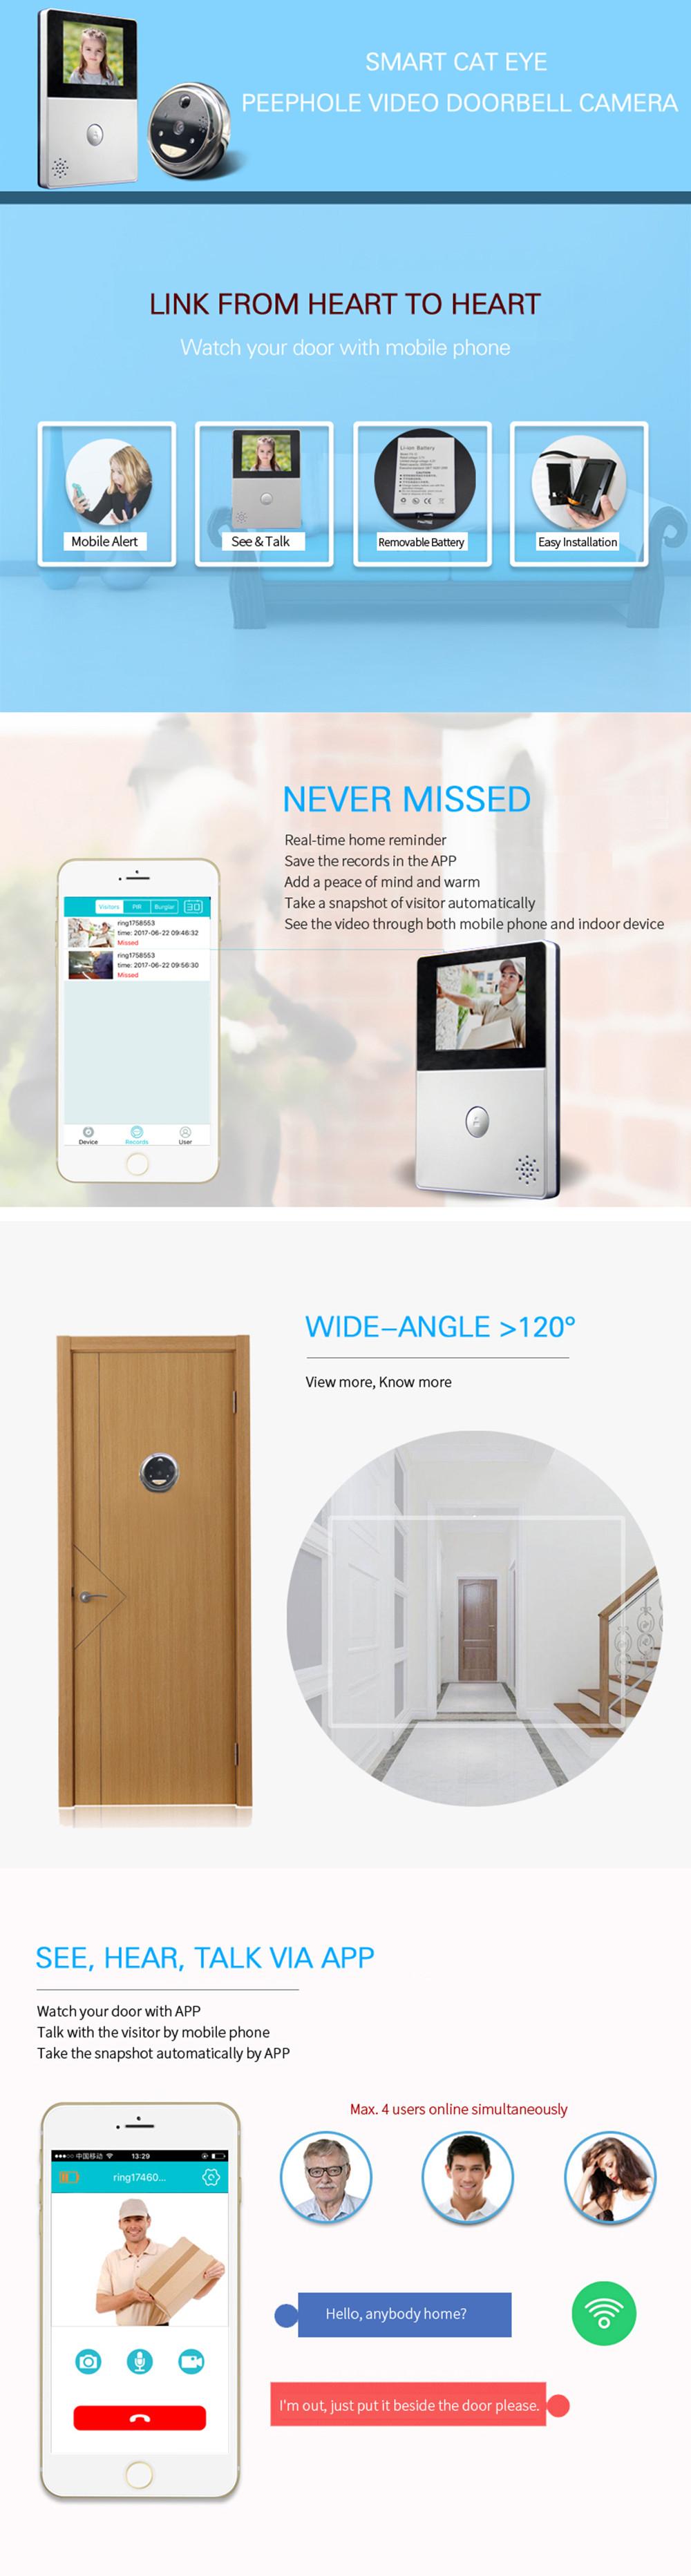 WiFi Peephole Video Doorbell Camera _Cat Eye_details1